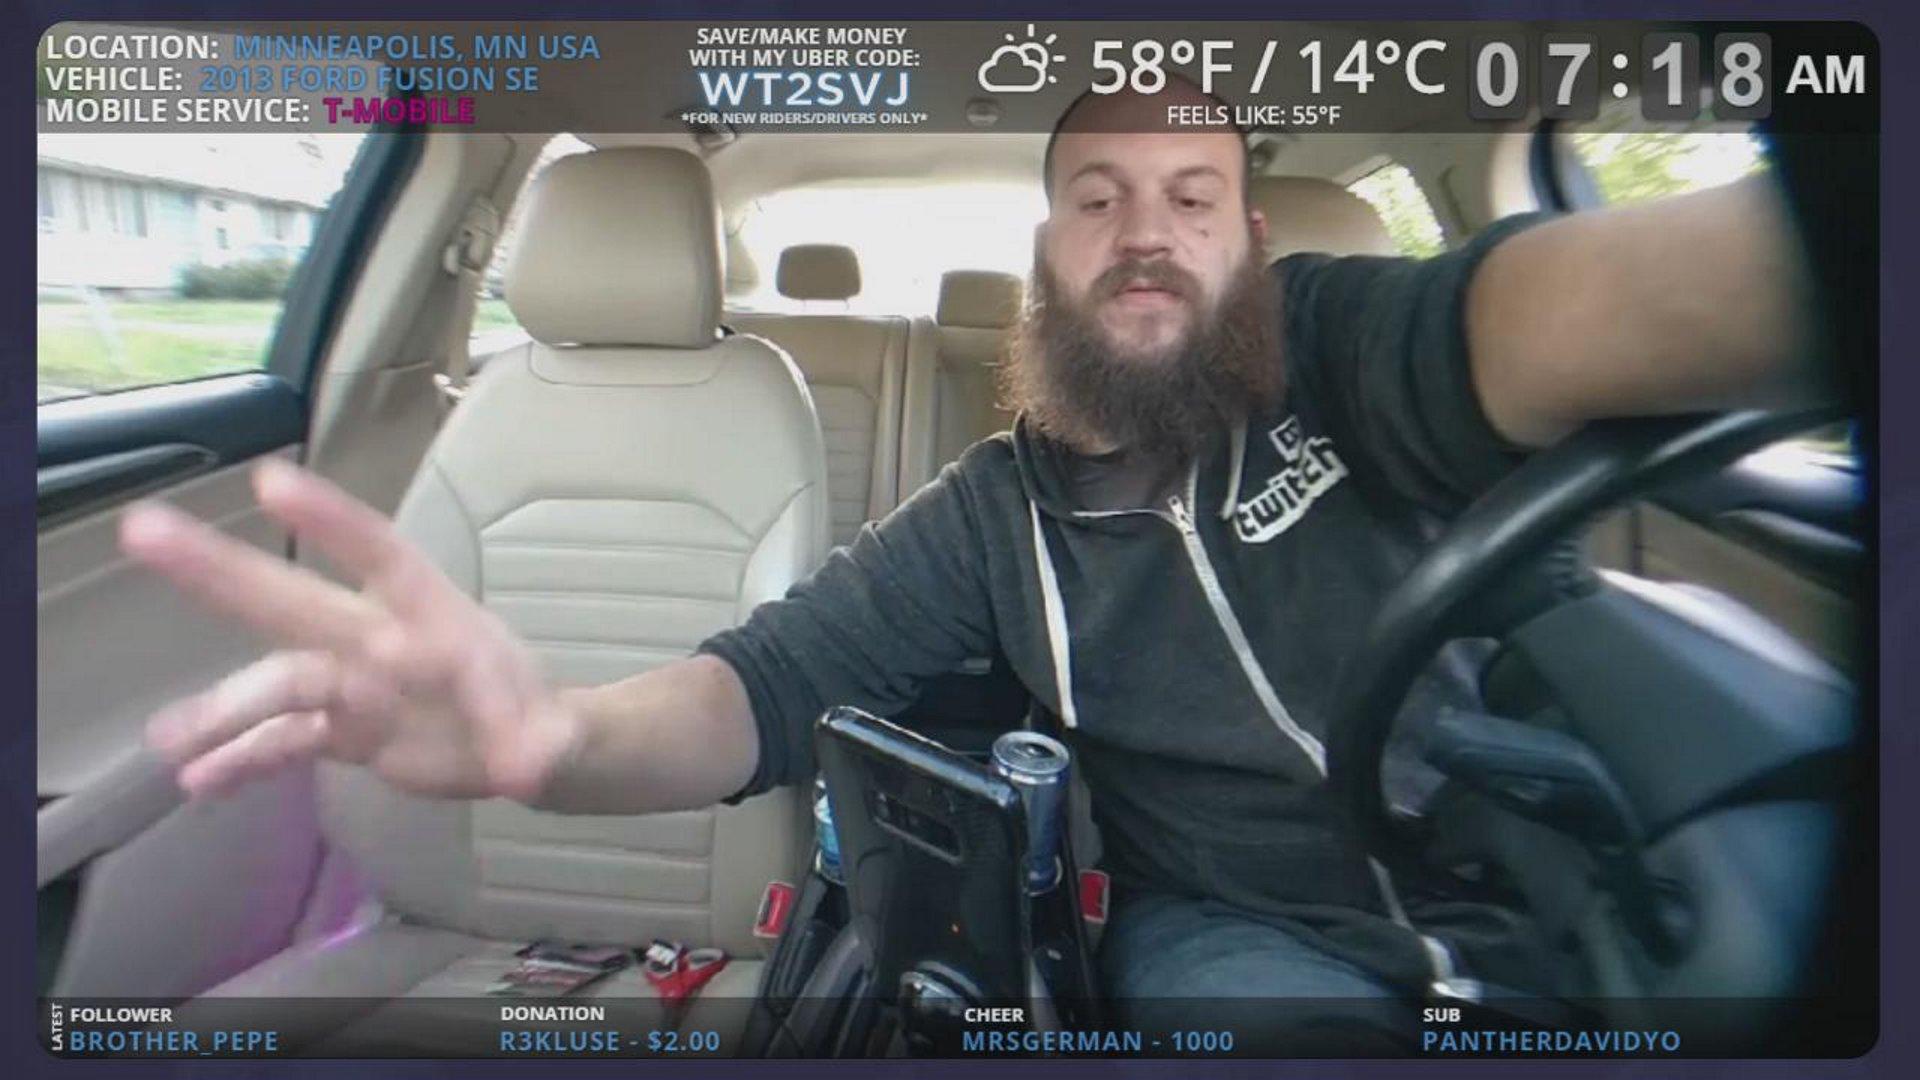 b3ckslife-ep-6-uber-driver-lowkey-thursday-cmds-irl-0600-httpst-colelbwgiyhb-httpst-coiuq3wckpco